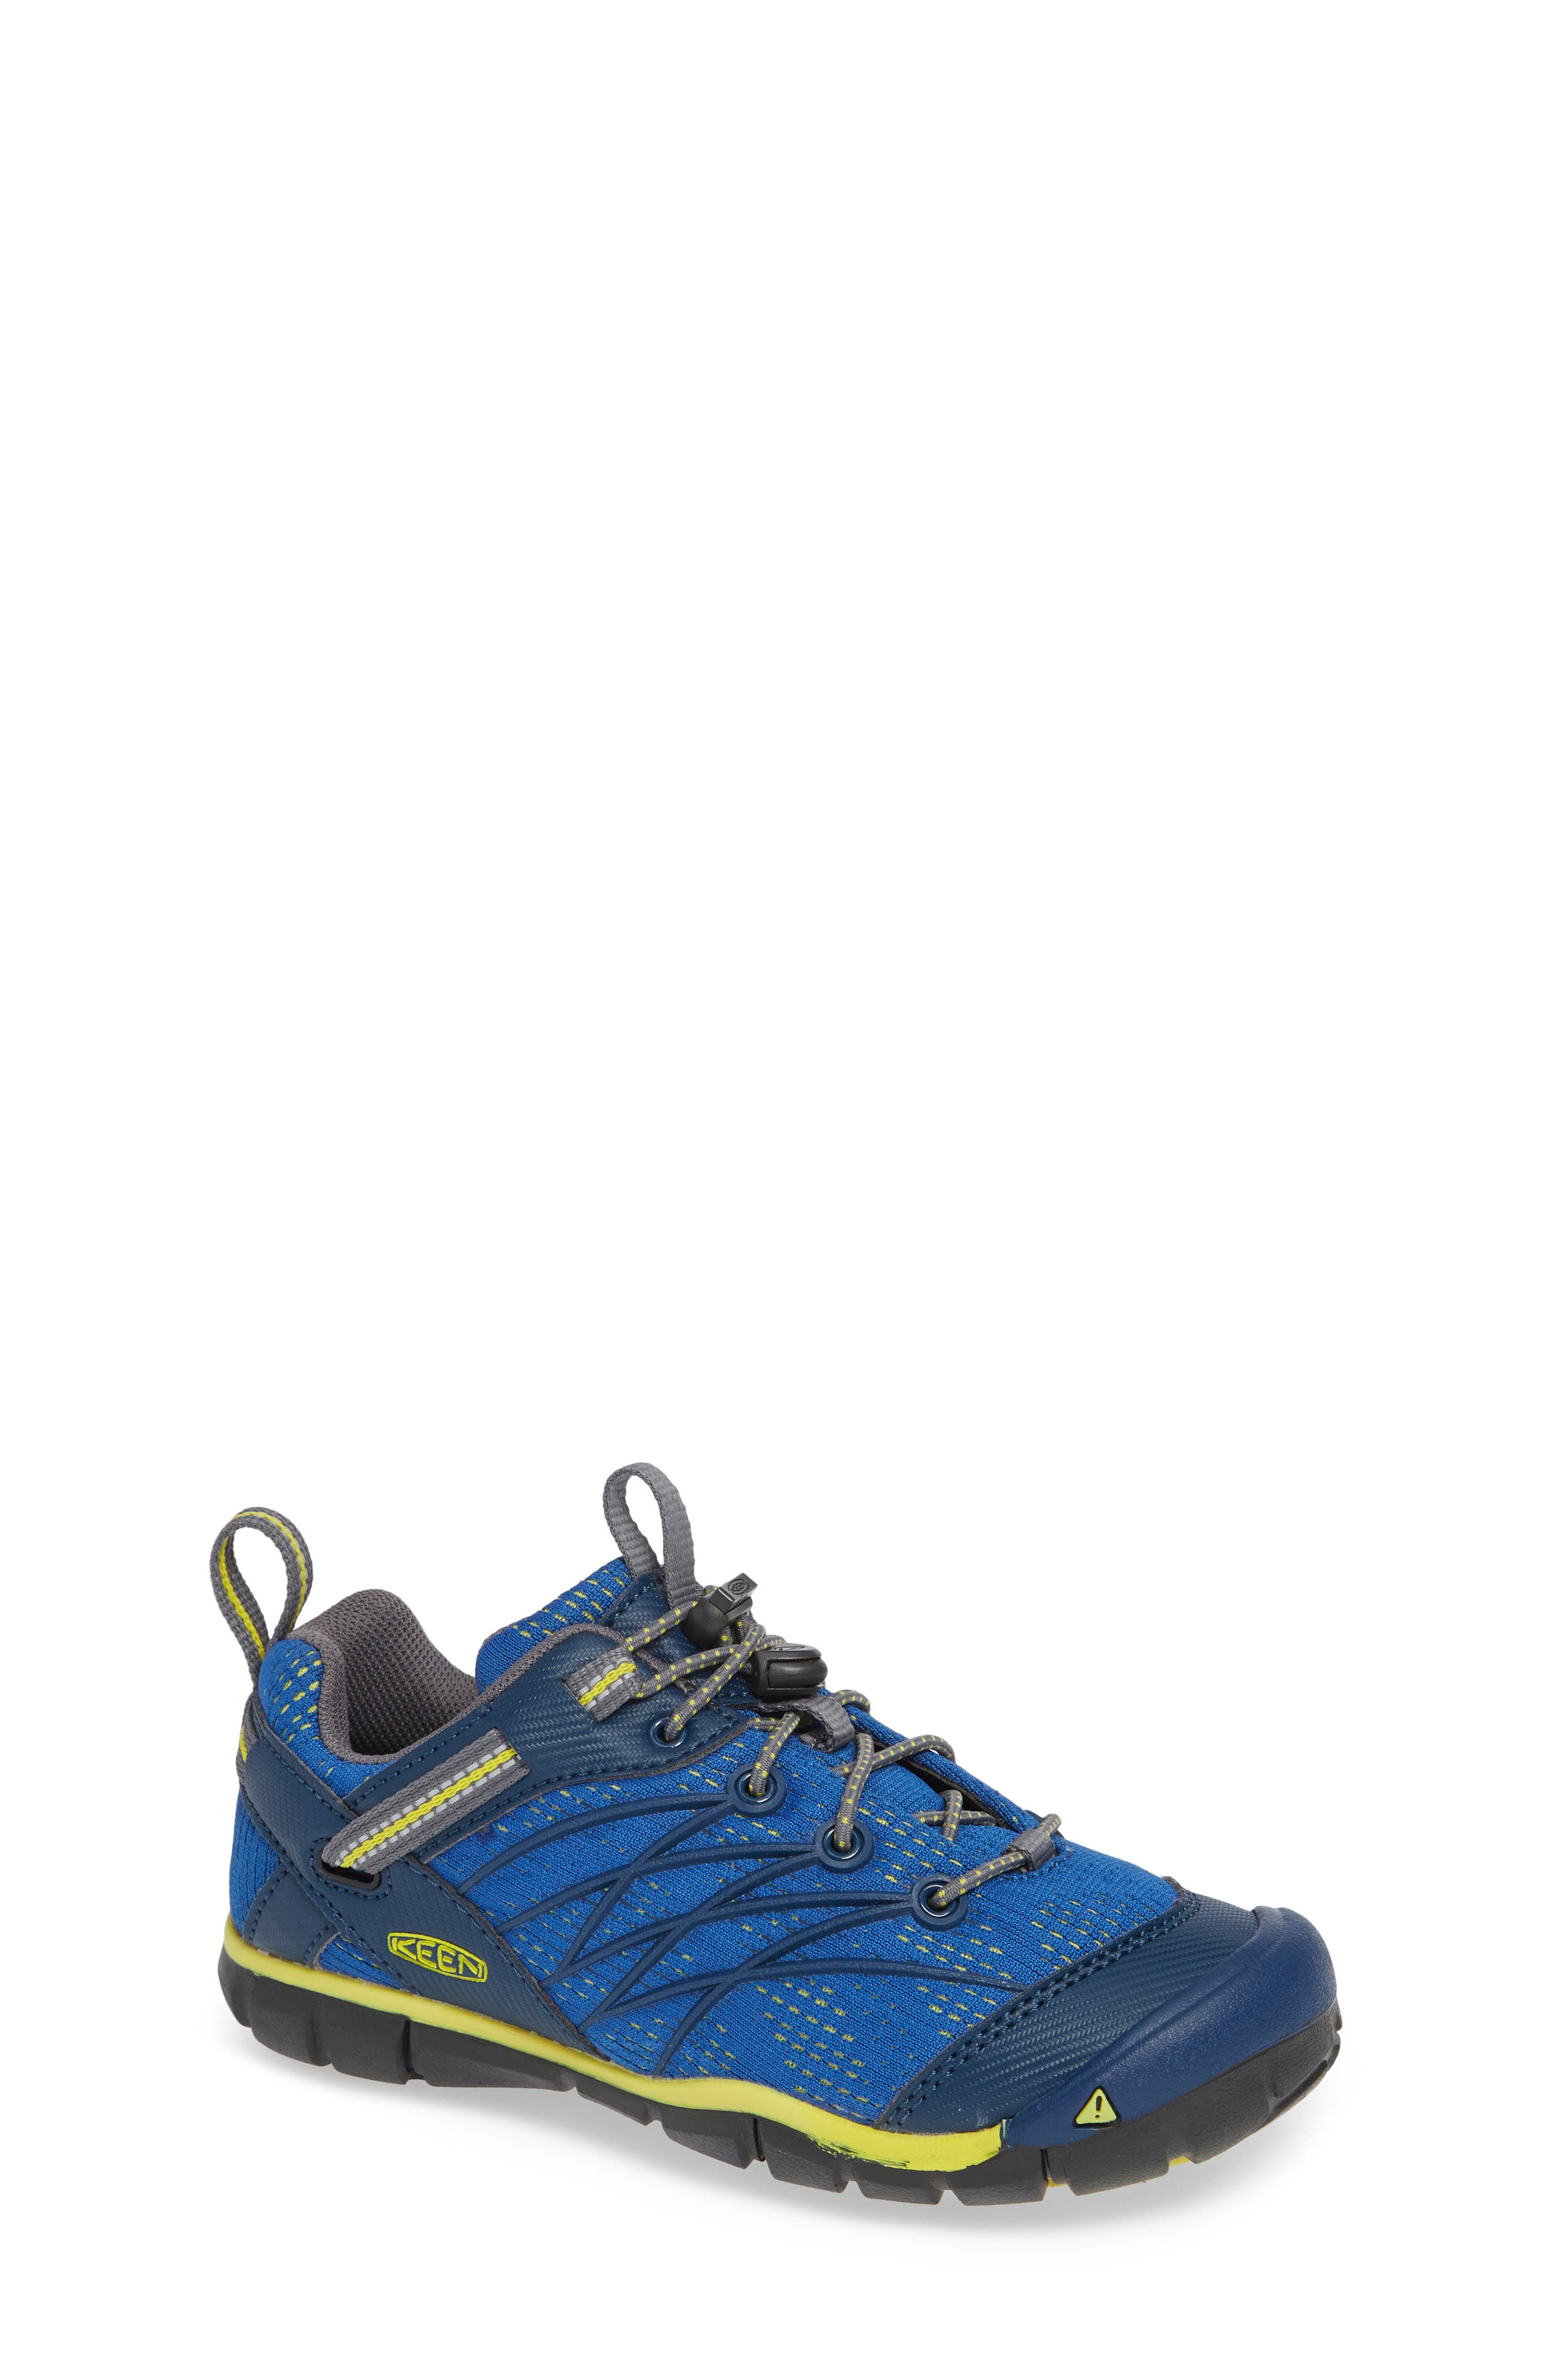 KEEN 'Chandler CNX' Water Friendly Sneaker, Main, color, BLUE OPAL/ BLUE